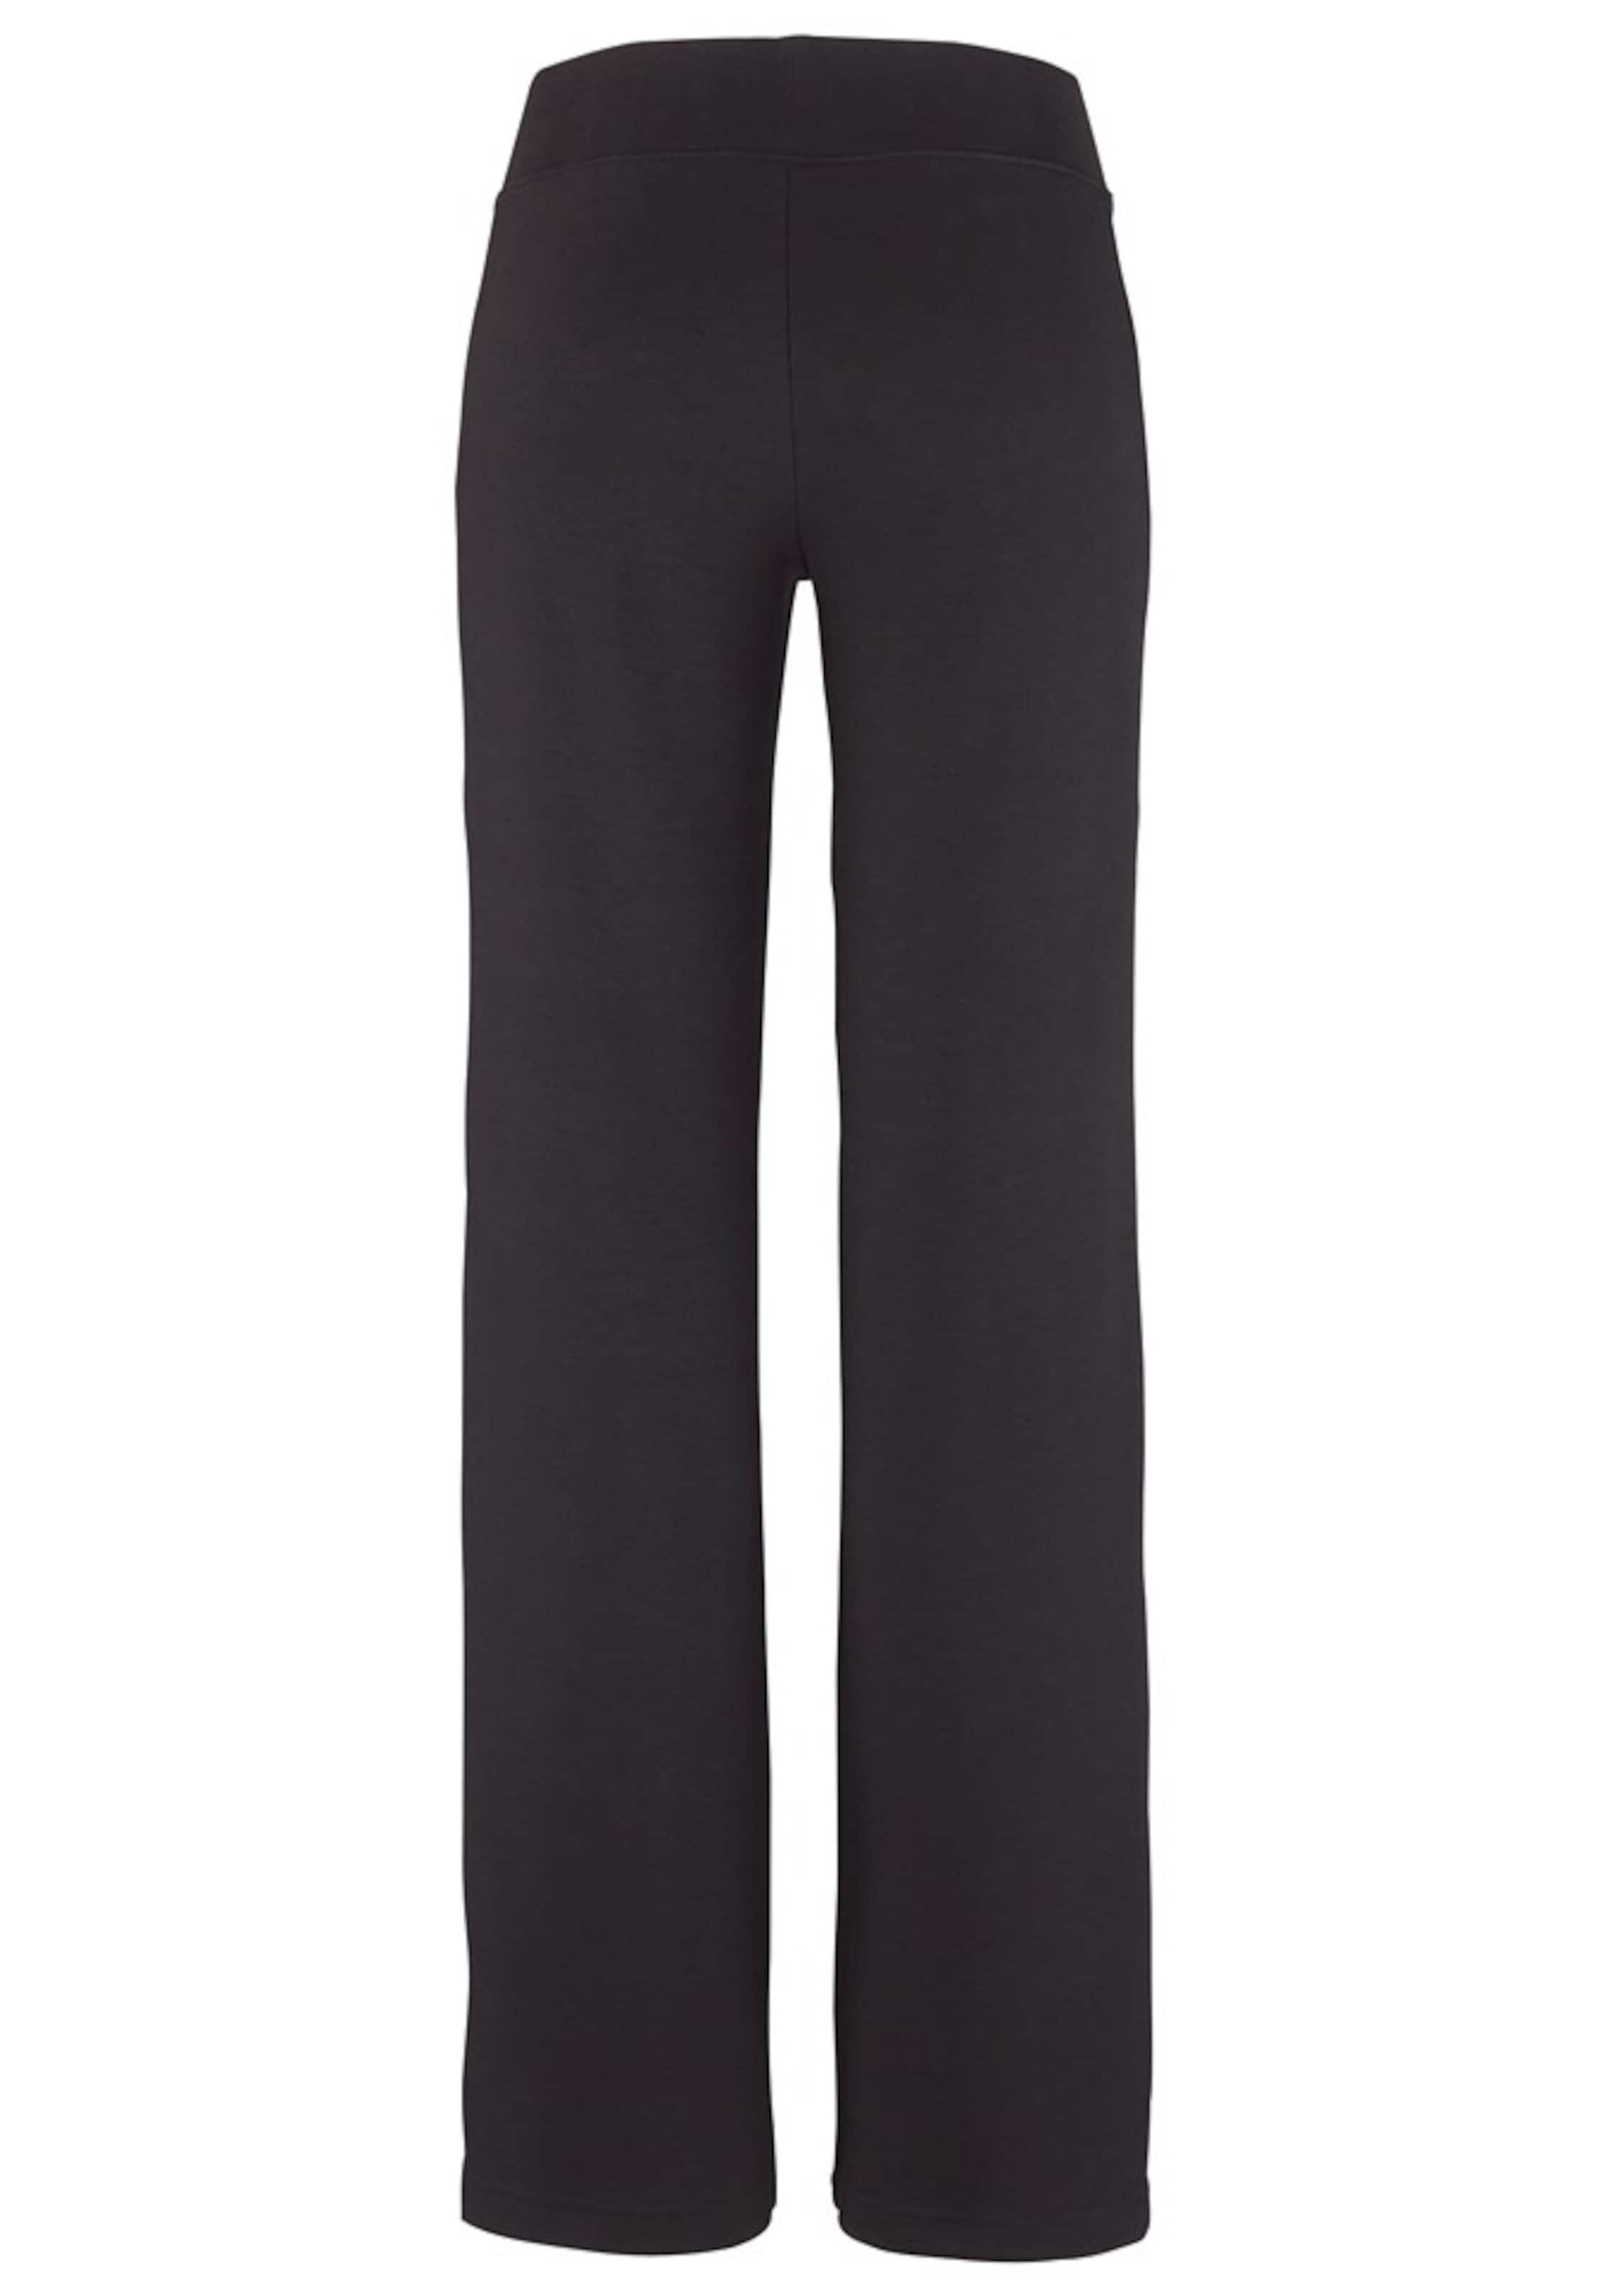 VIVANCE Homewear-Hose Große Auswahl An Rabatt 100% Authentische Footlocker Finish Zum Verkauf Billige Fälschung 2LEWMc4GC